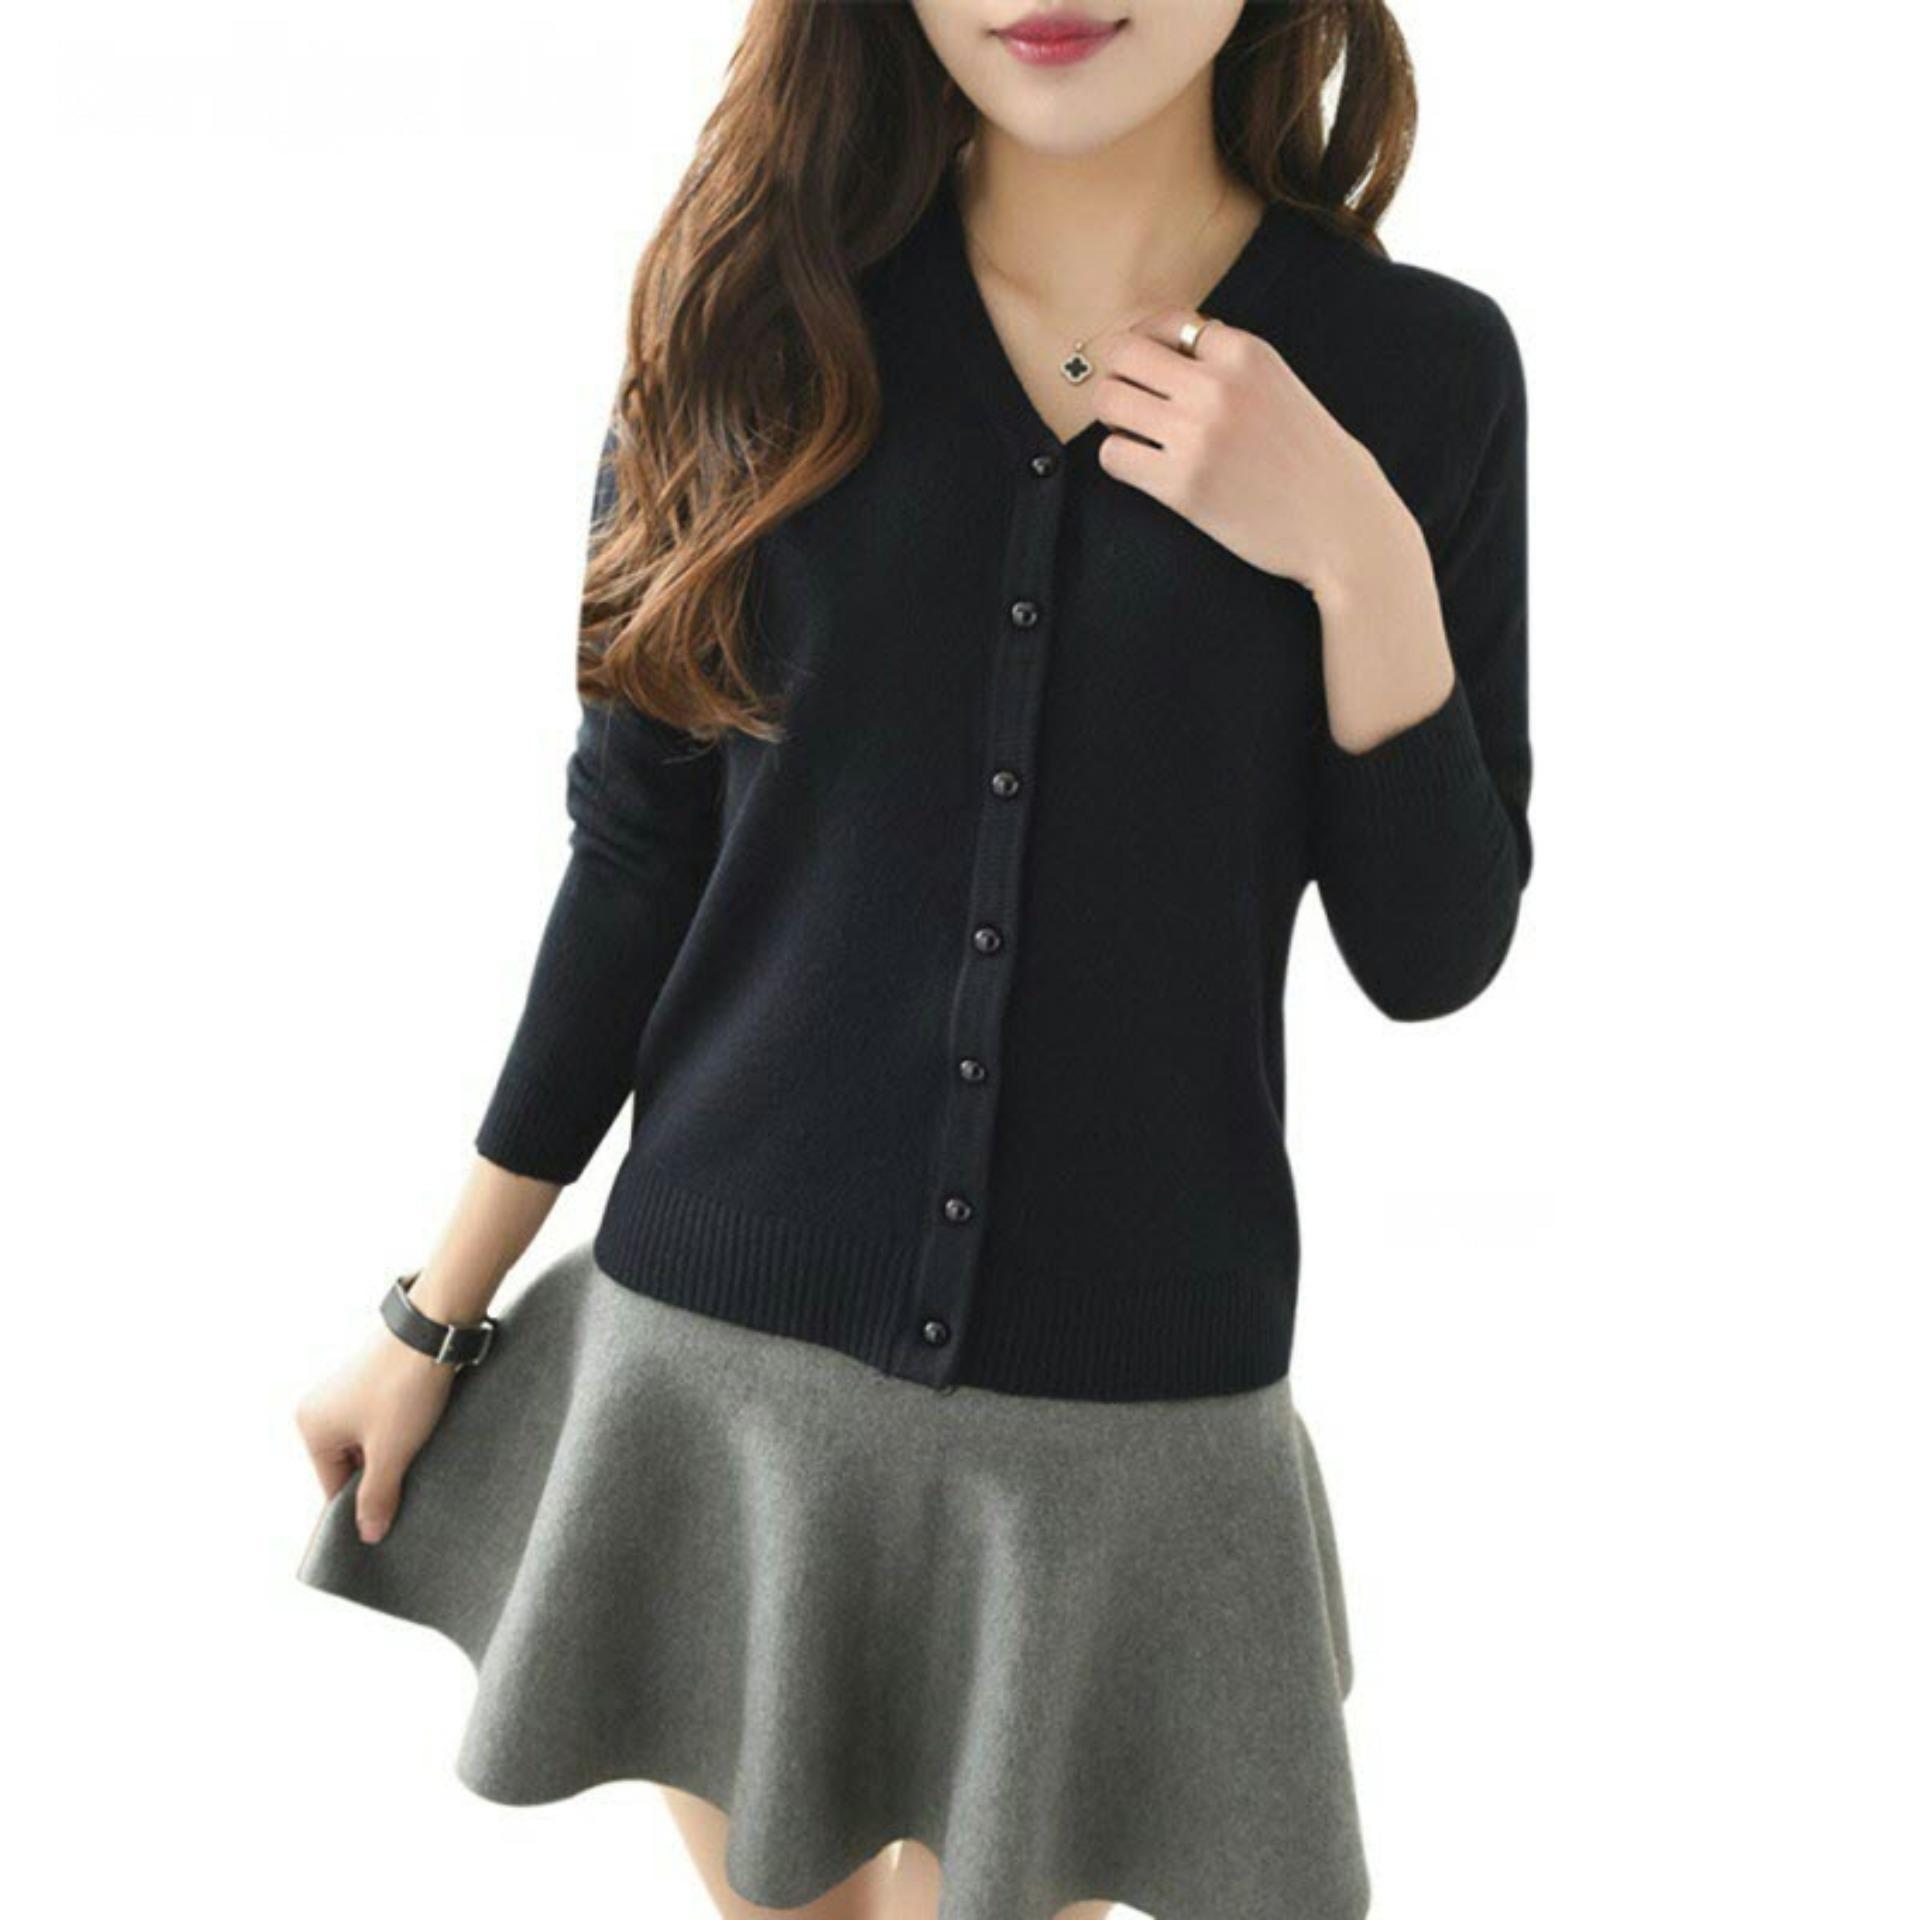 Cardigan Wanita Rajut MSR172 / Kardigan / Sweater / Jaket / Baju Hangat / Luaran /